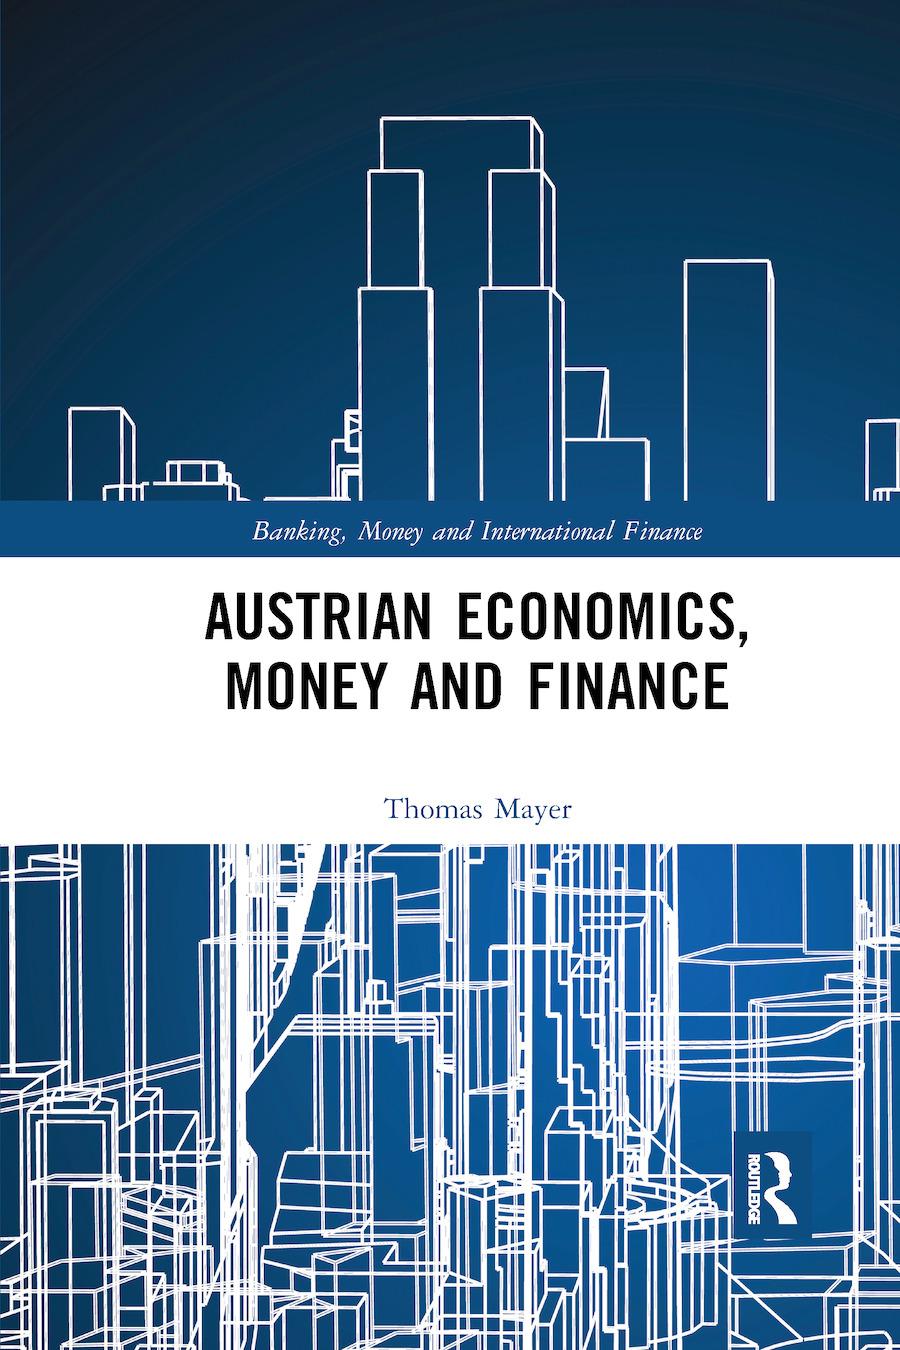 Austrian Economics, Money and Finance book cover